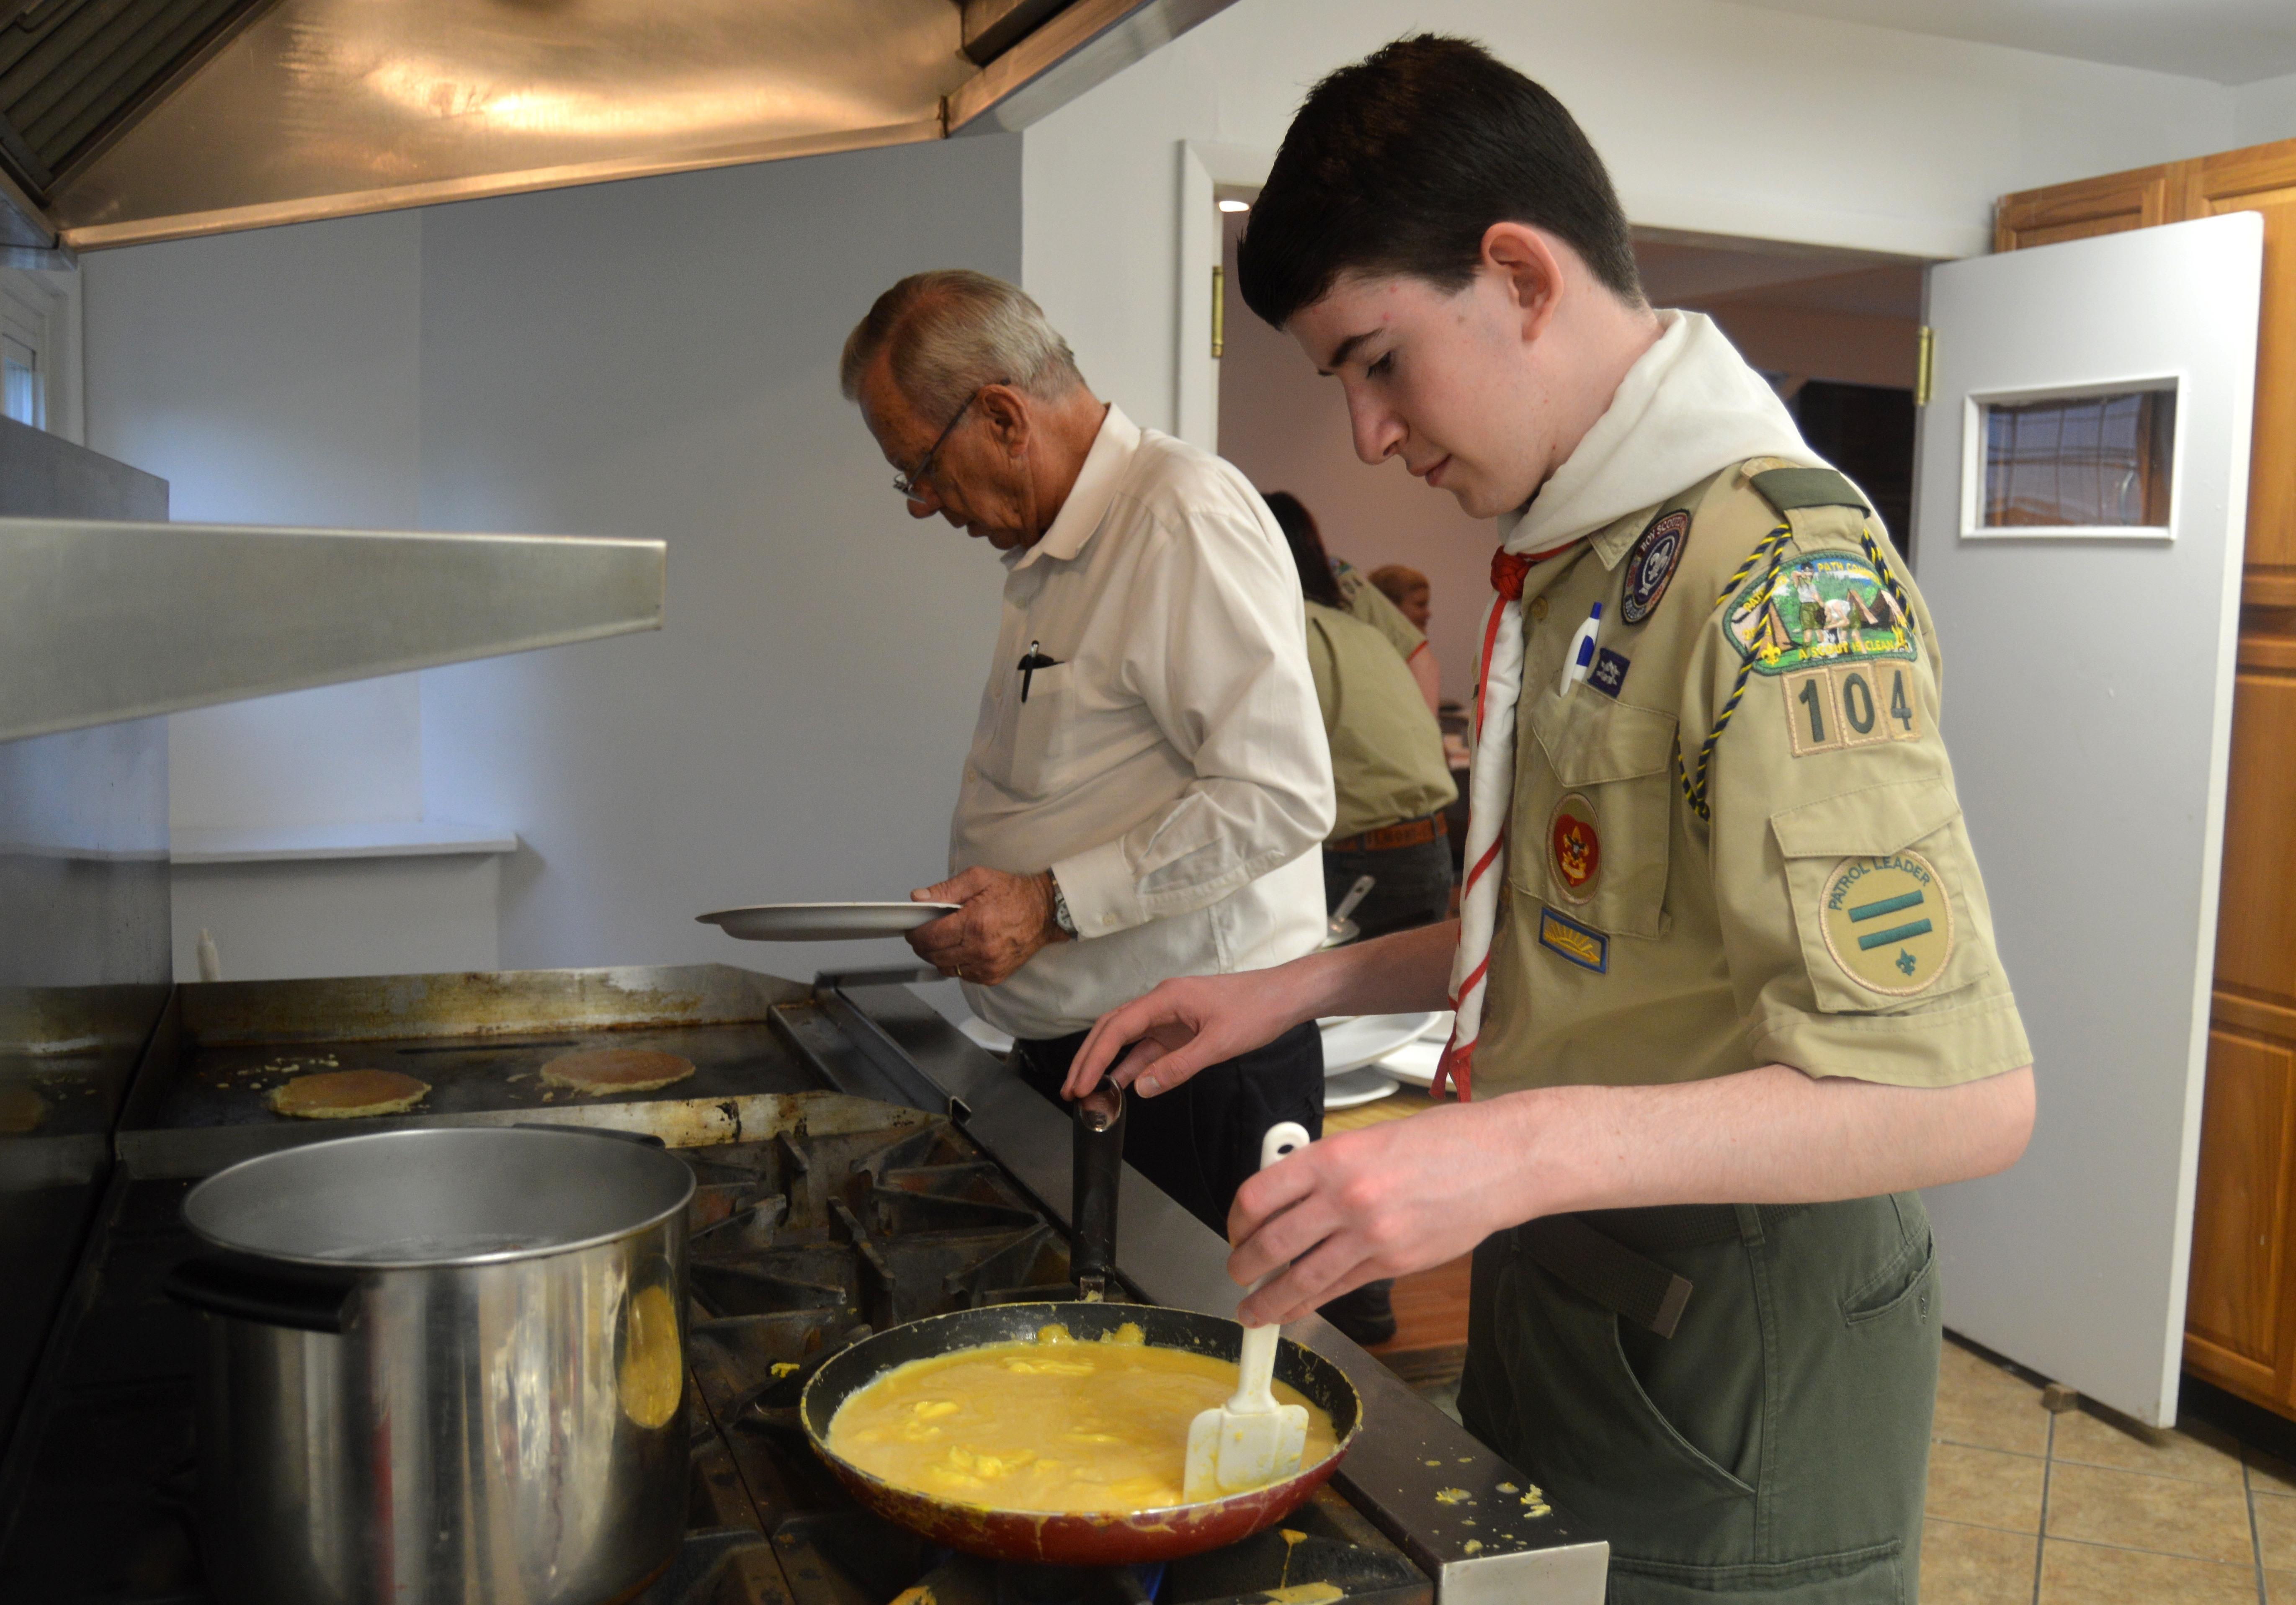 063199f5d107c31dd810_Jack_Thal_cooks_scrambled_eggs_at_the_Lions_Club.JPG